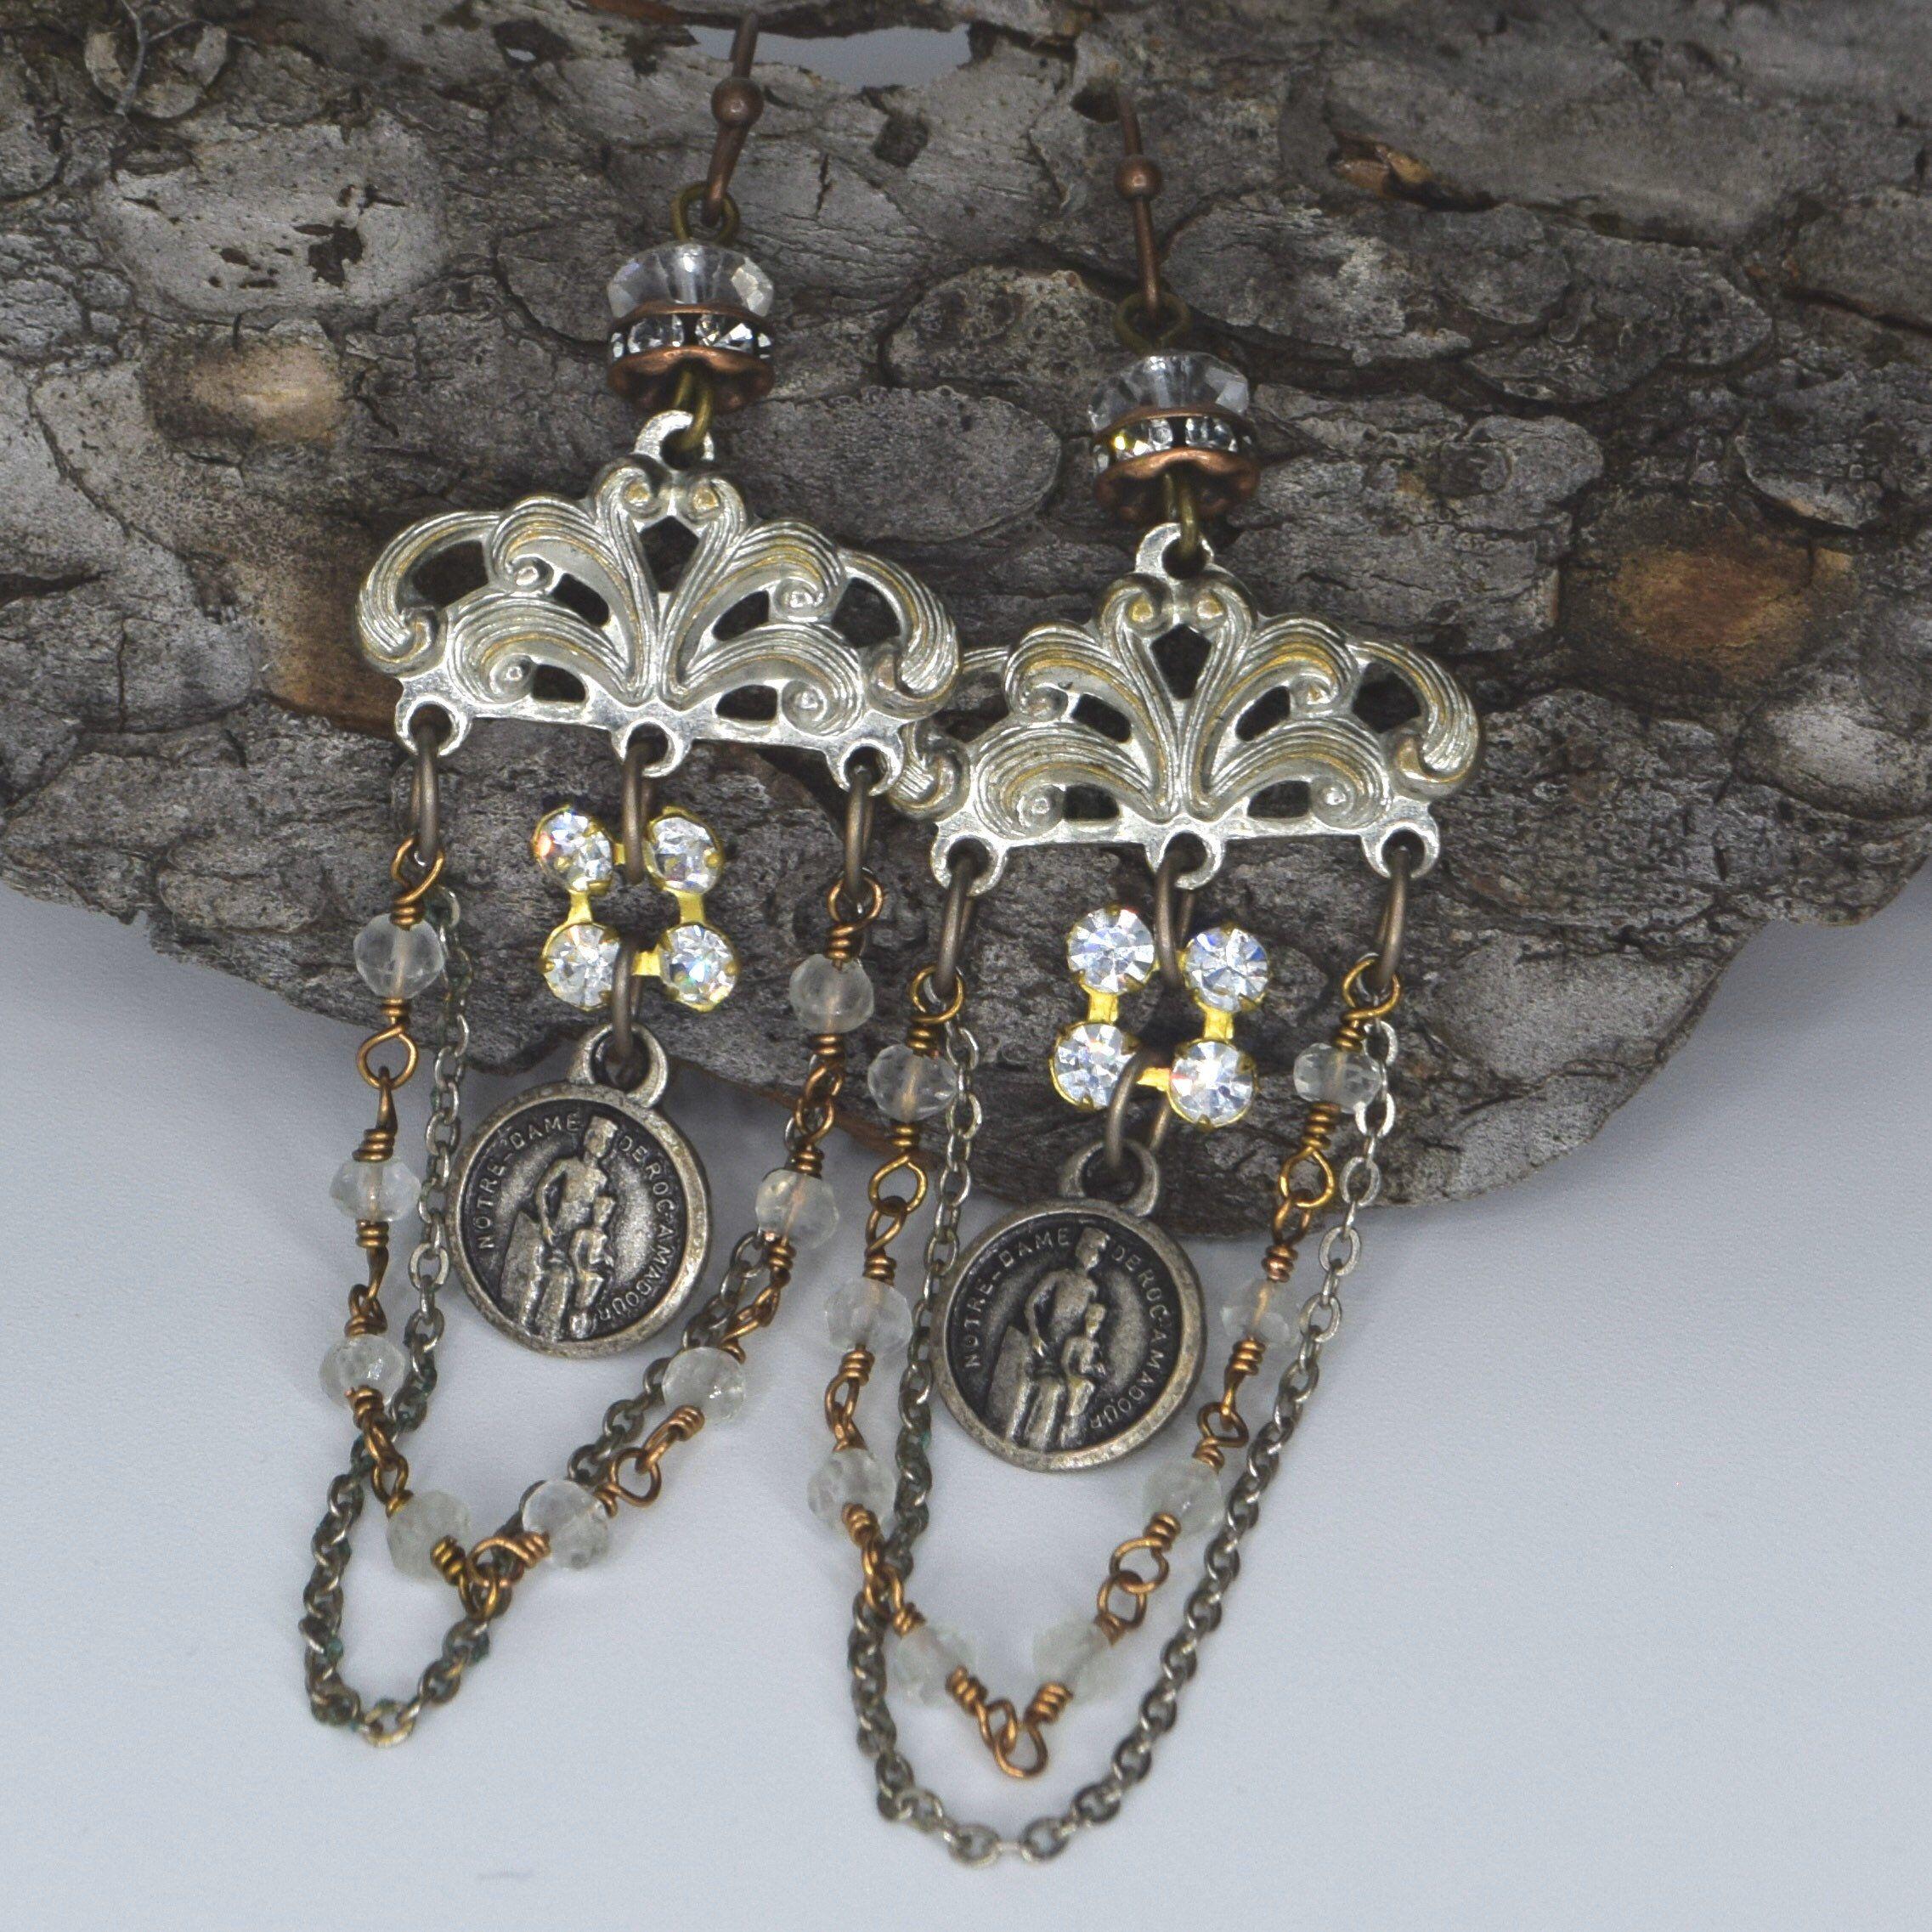 Religious Medal Chandelier Earrings, Vintage Rhinestone Chandelier Earrings #vintagerhinestone